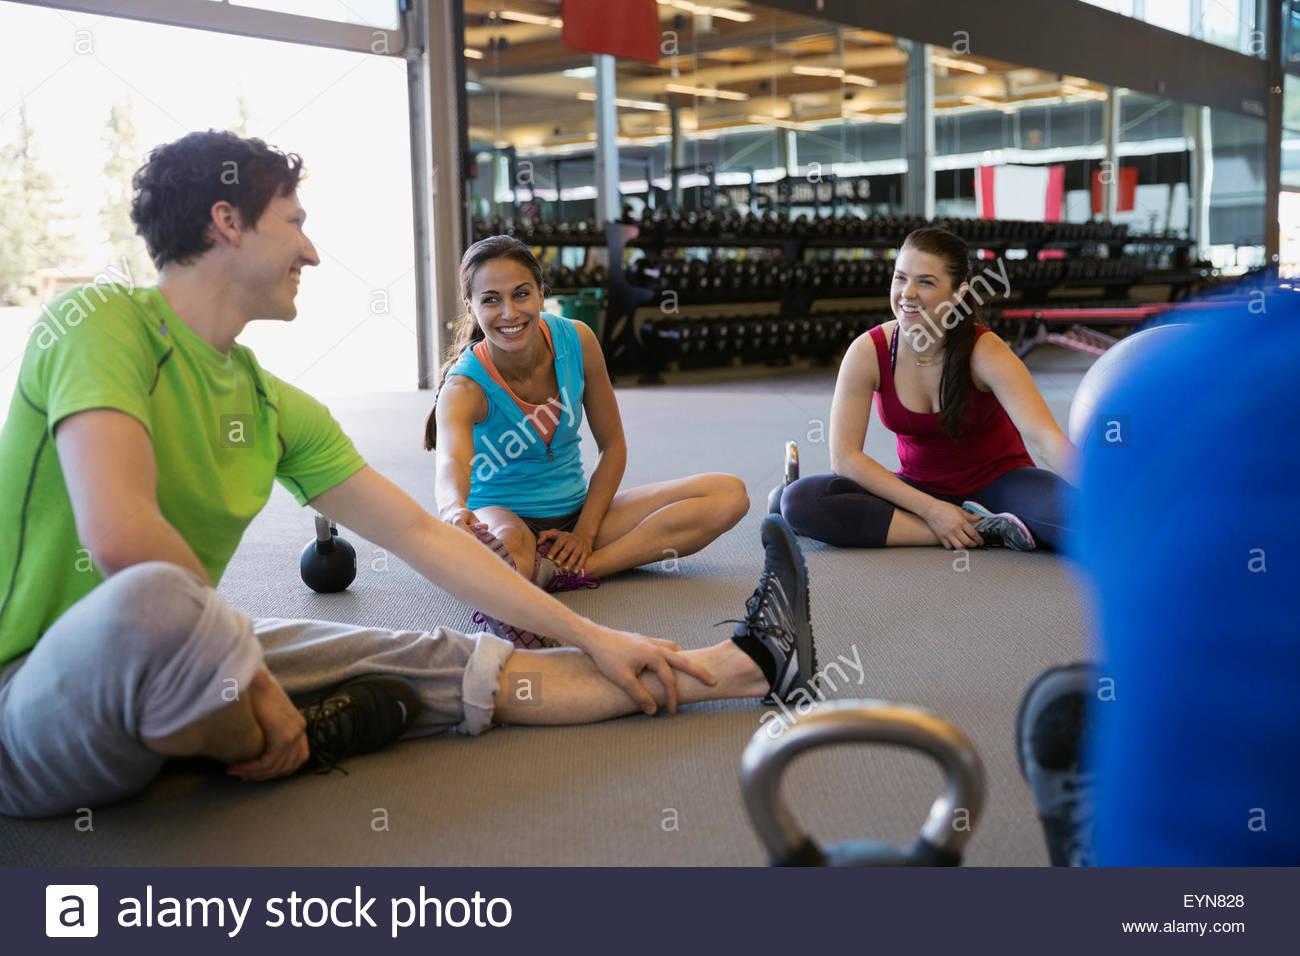 Classe di esercizio di stretching bicipiti femorali in palestra Immagini Stock